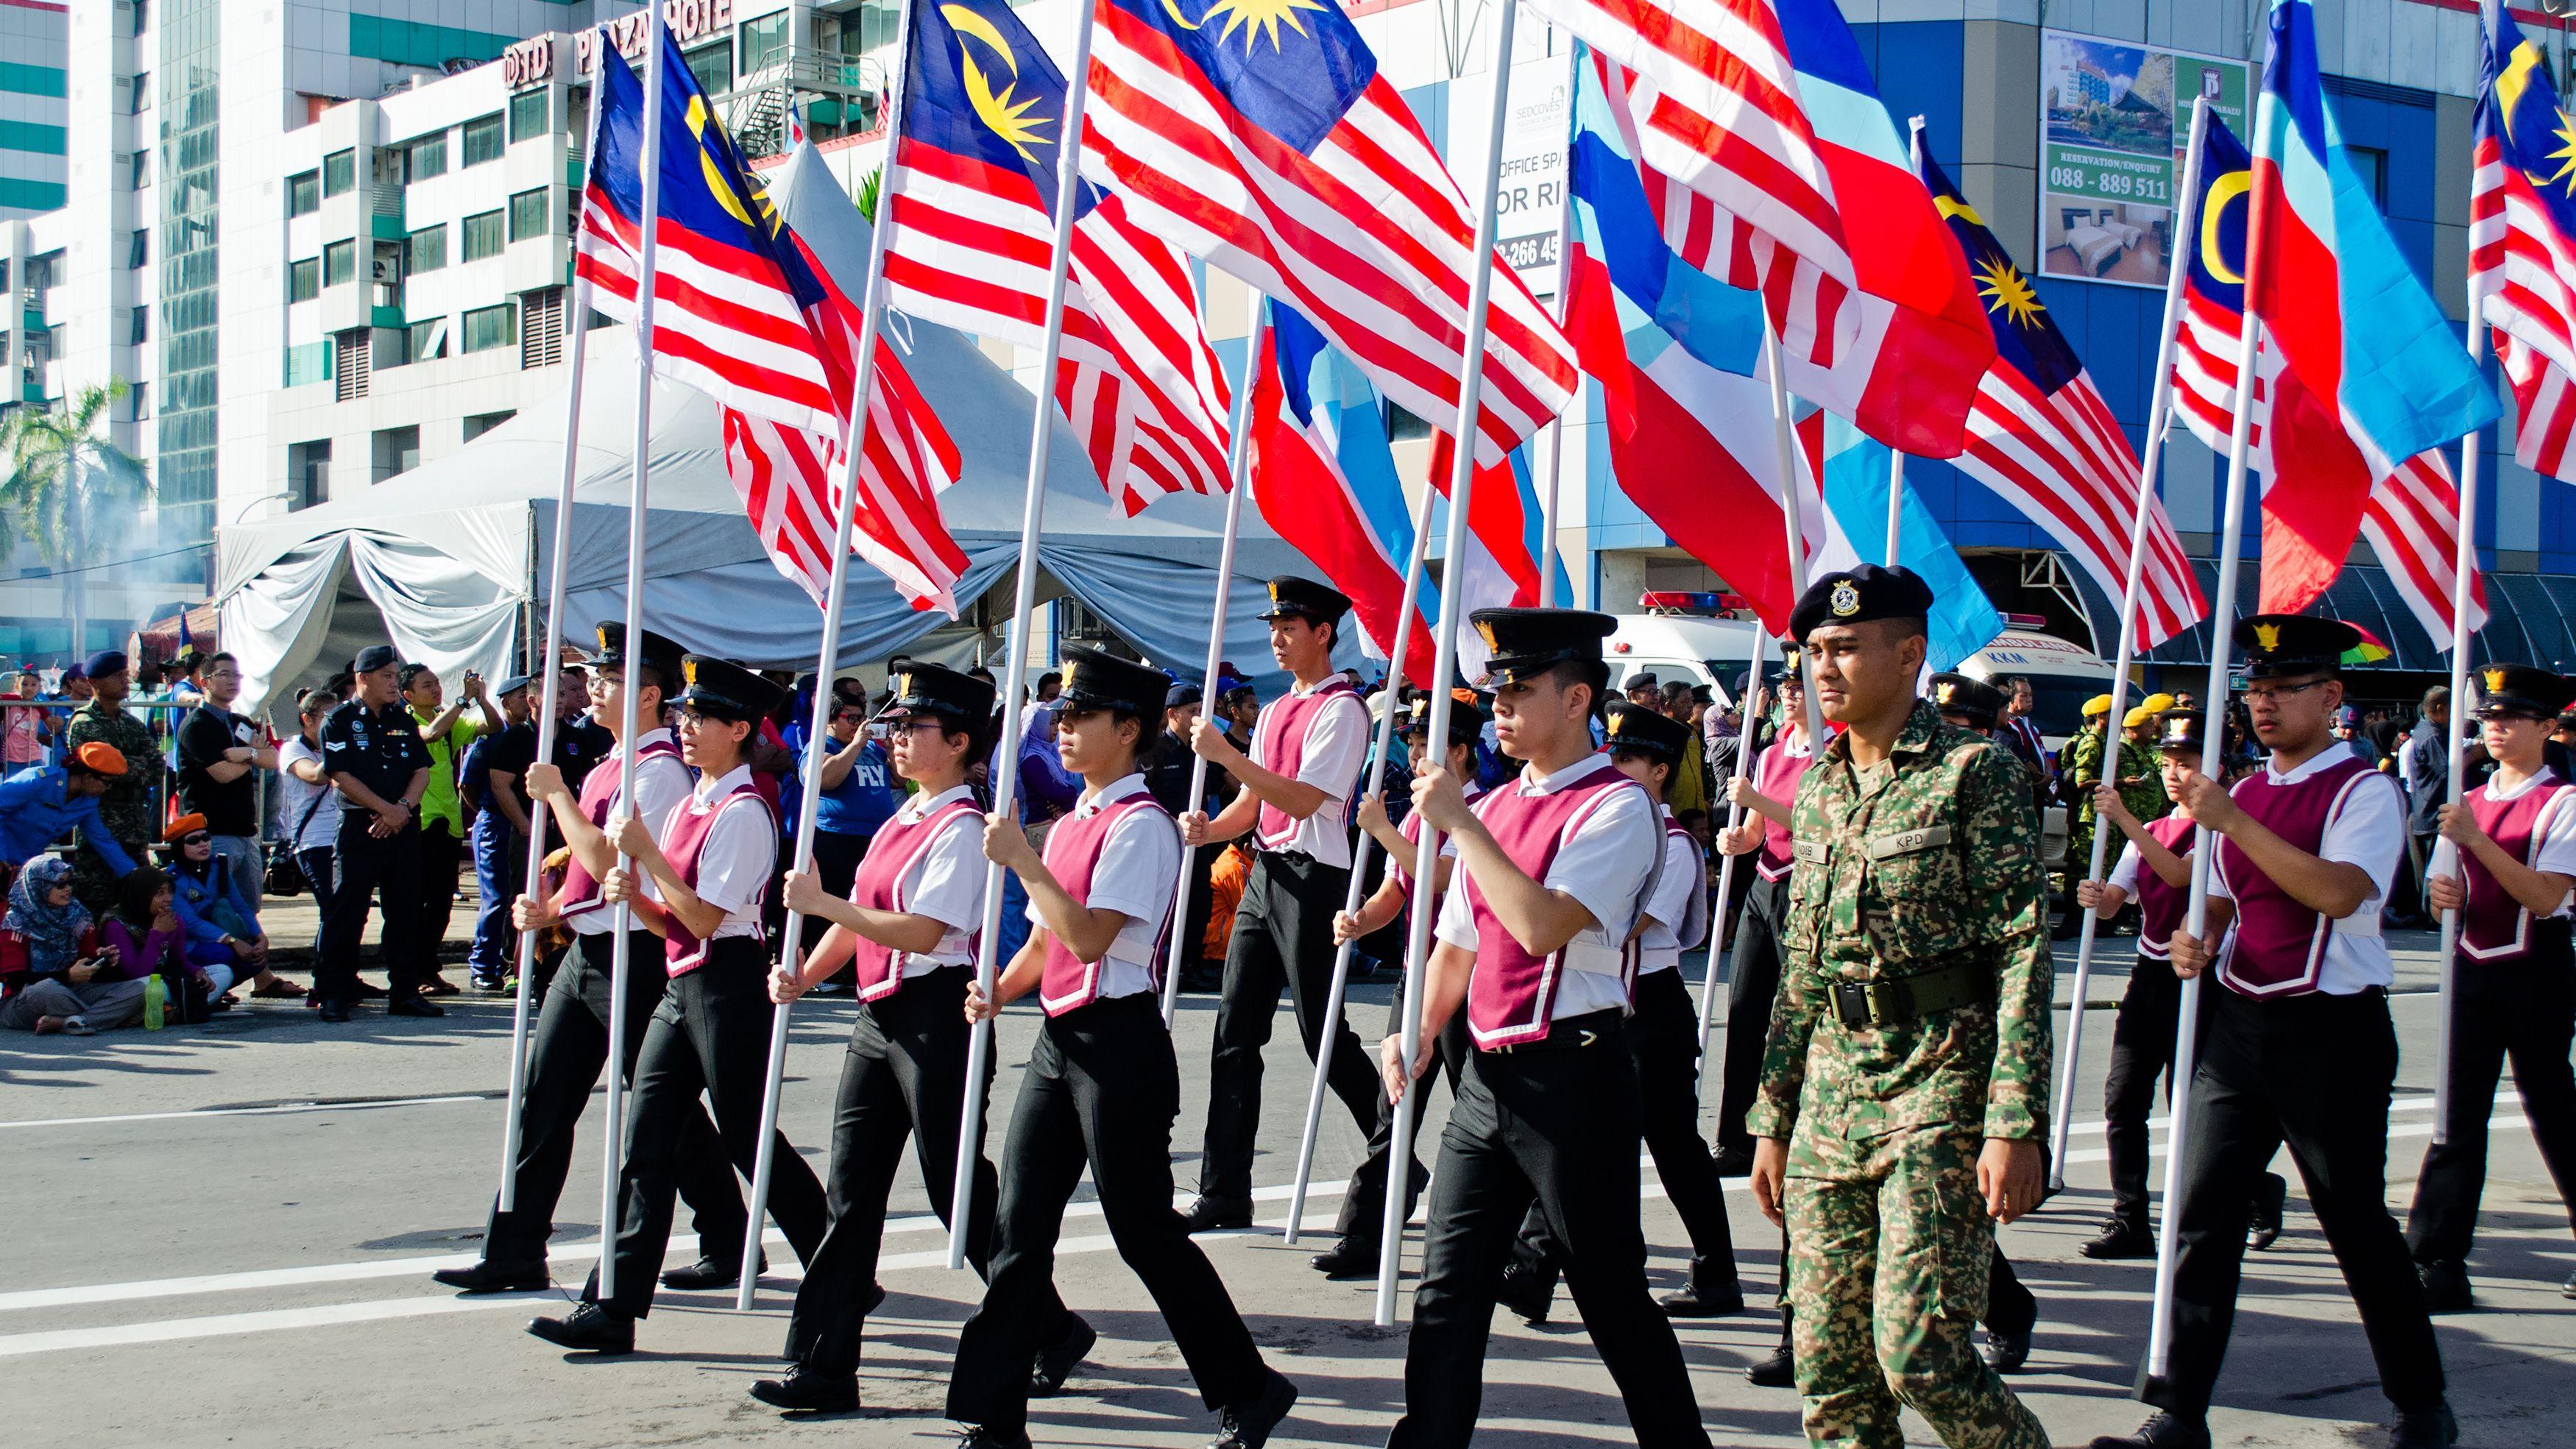 Celebrating Hari Merdeka: Independence Day in Malaysia